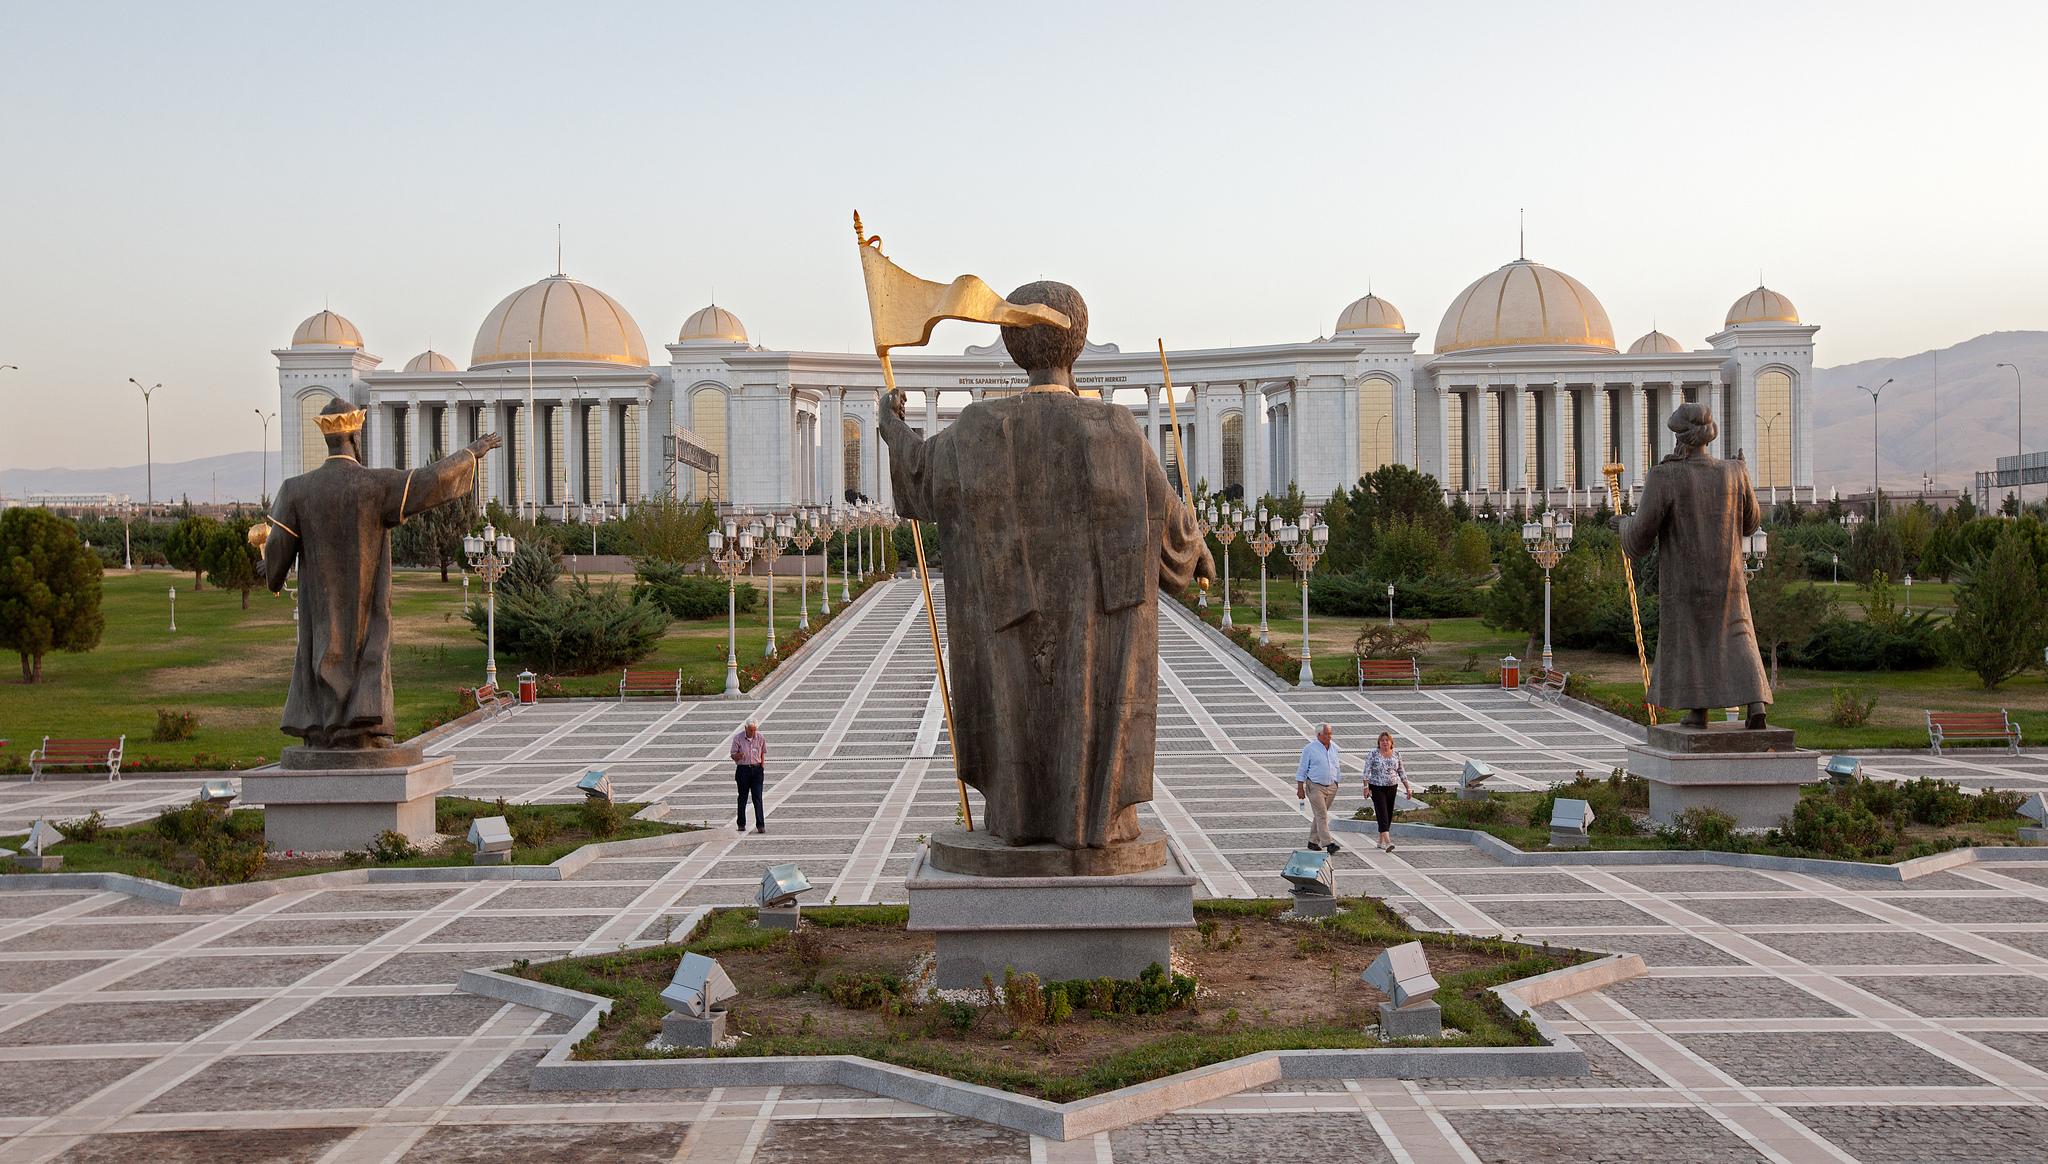 turkmenistan-original-32169